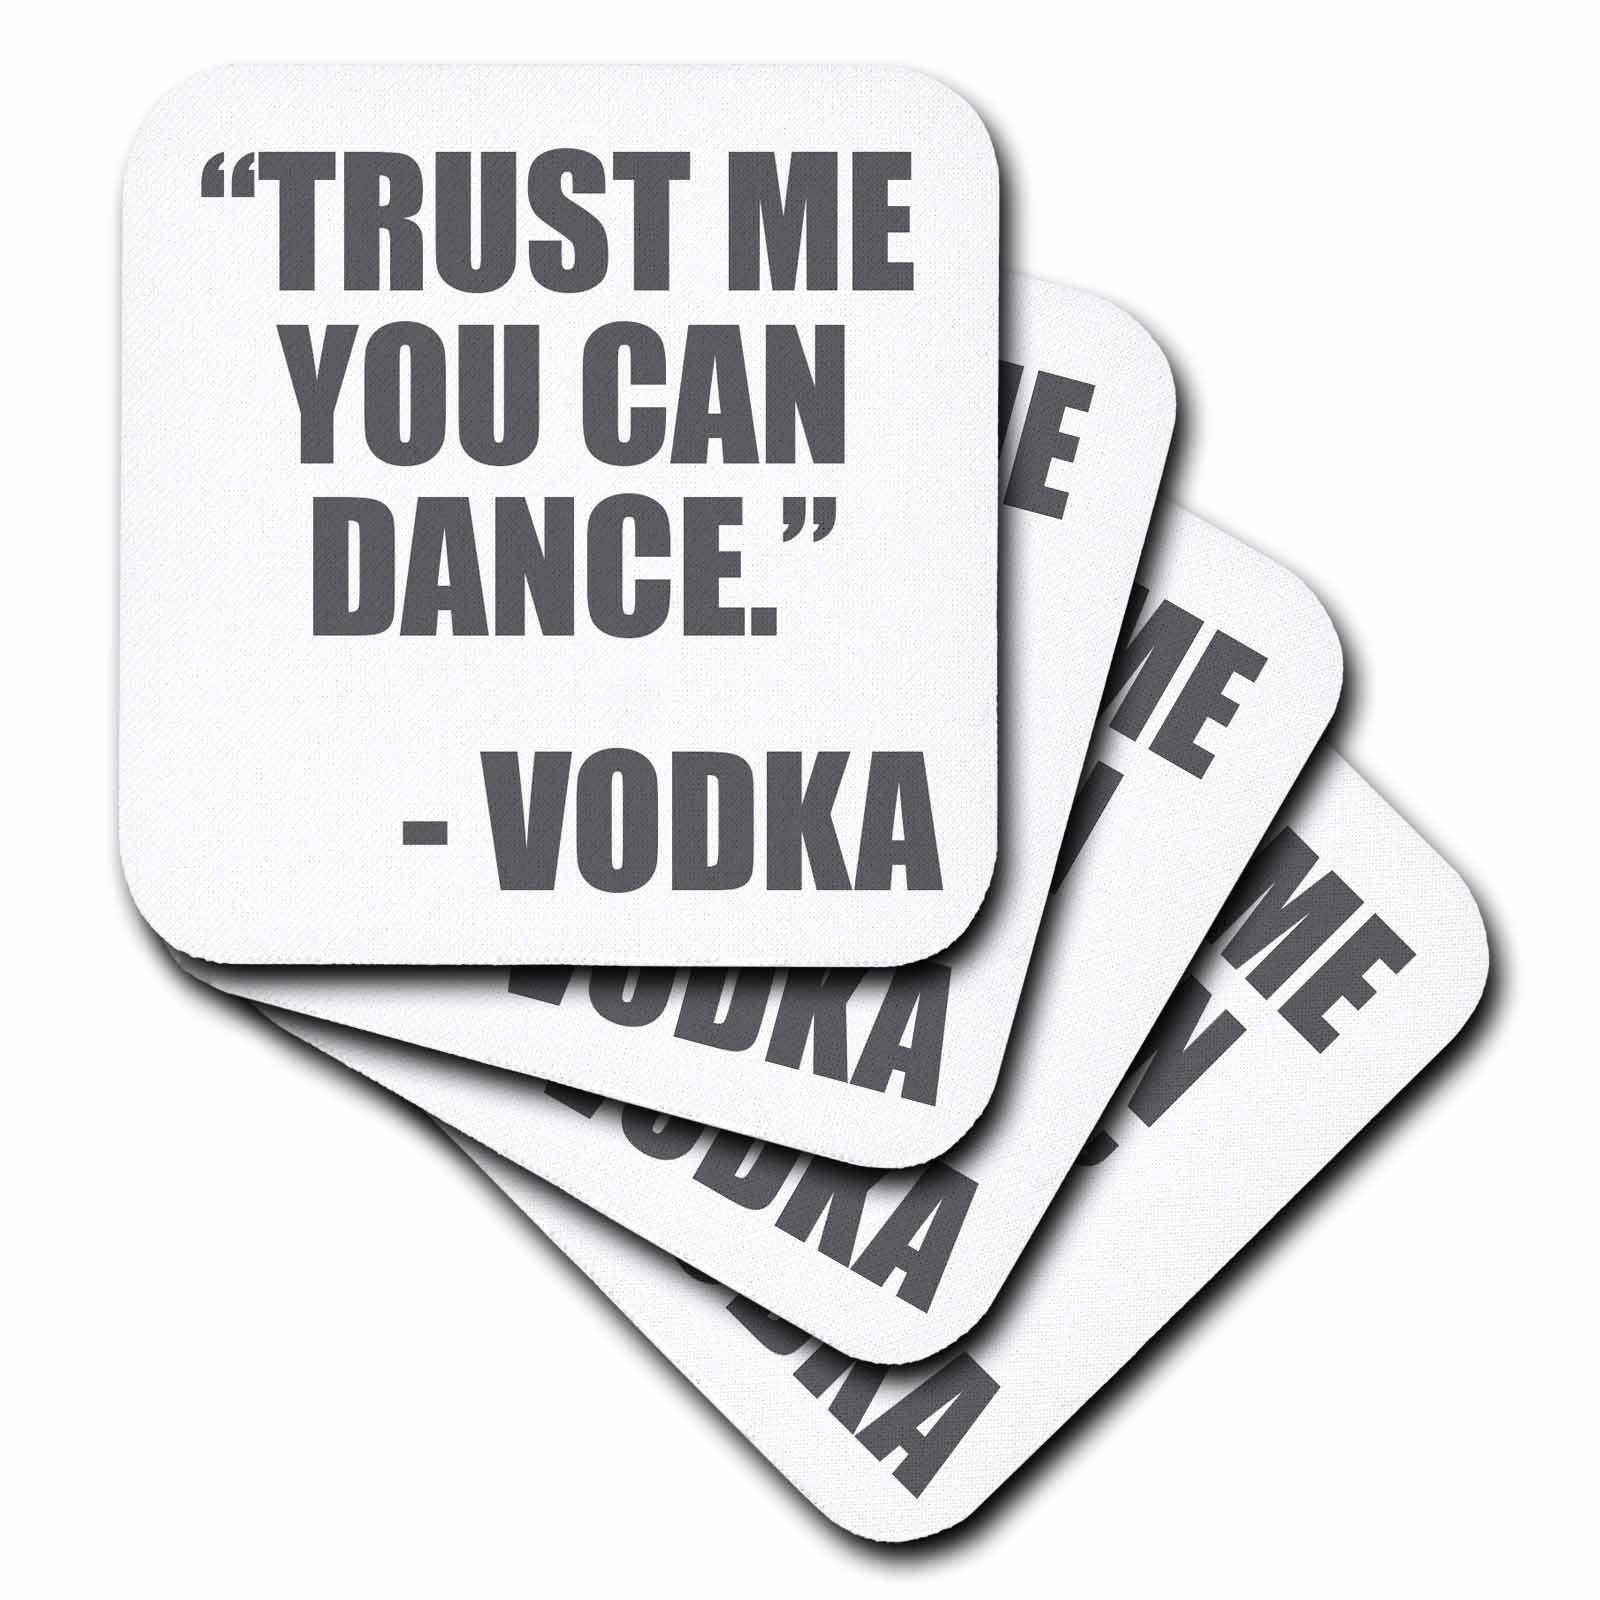 3dRose cst_163892_1 Trust Me You Can Dance Vodka, Grey Soft Coasters, Set of 4